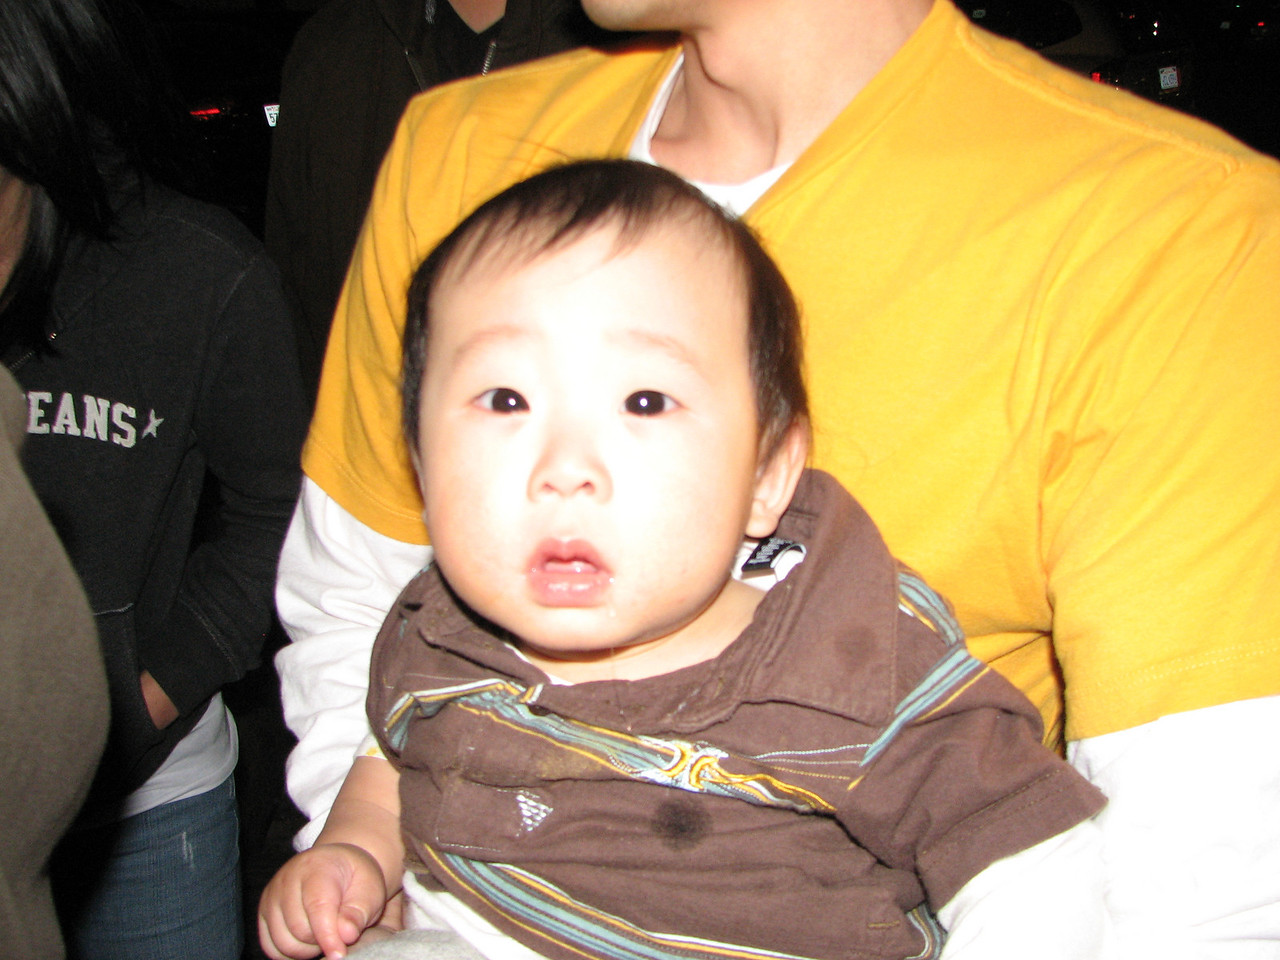 2008 05 24 Sat - Carter Tsai in Jimmy Chen's arms